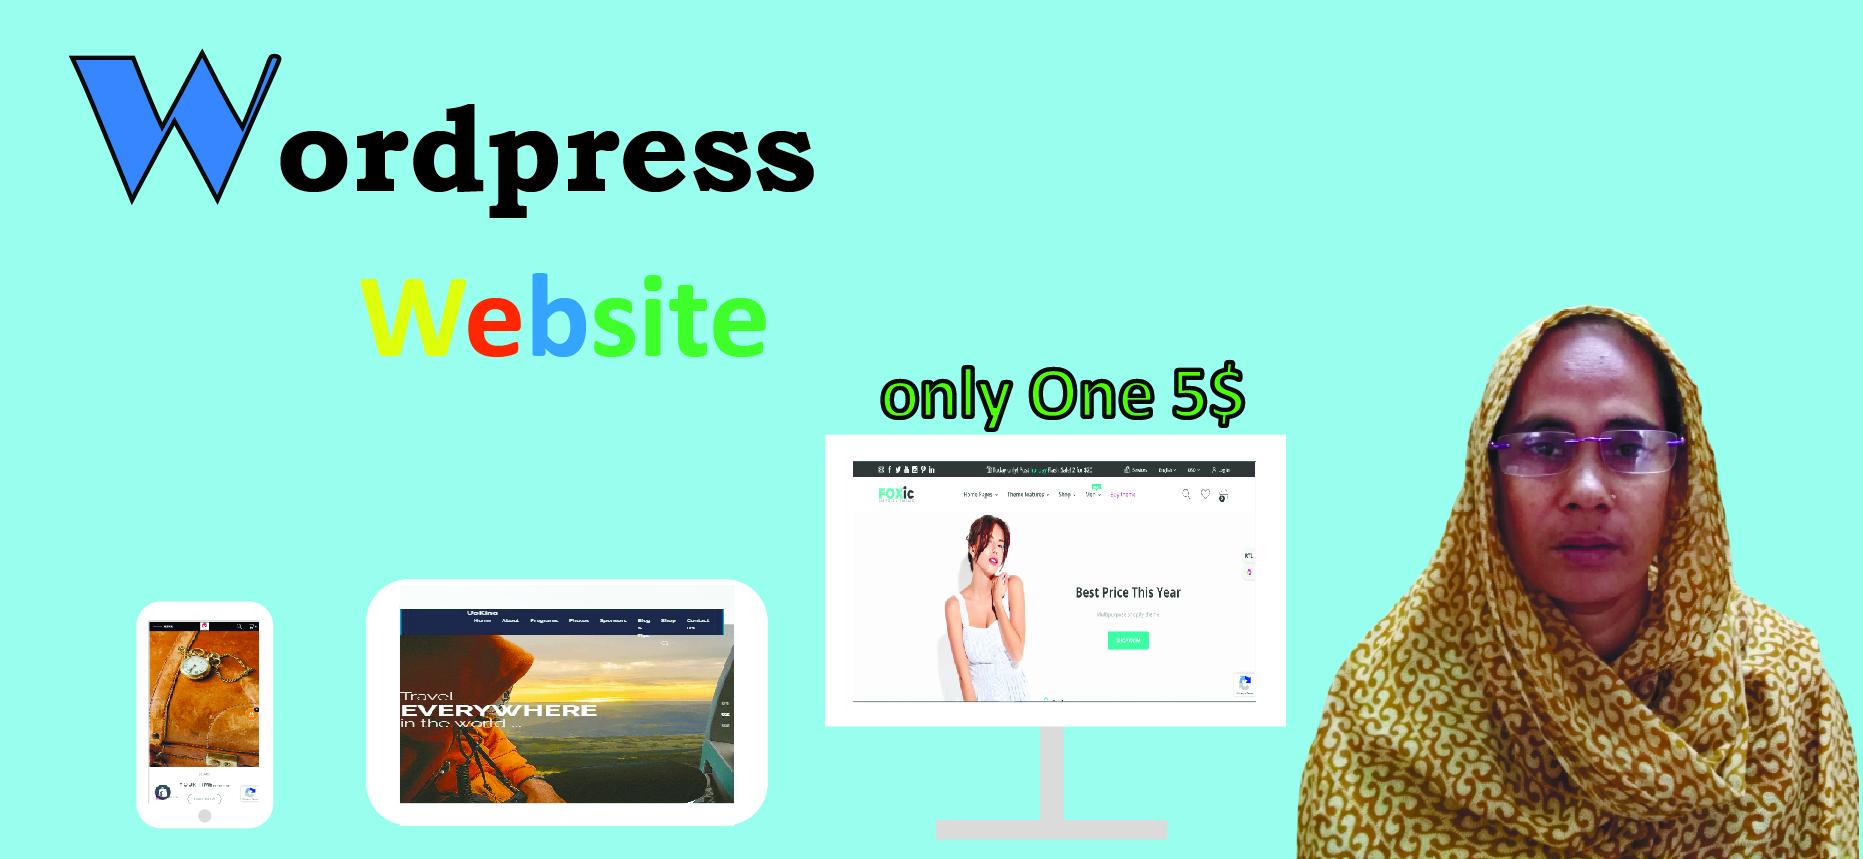 Create a personal wordpress website